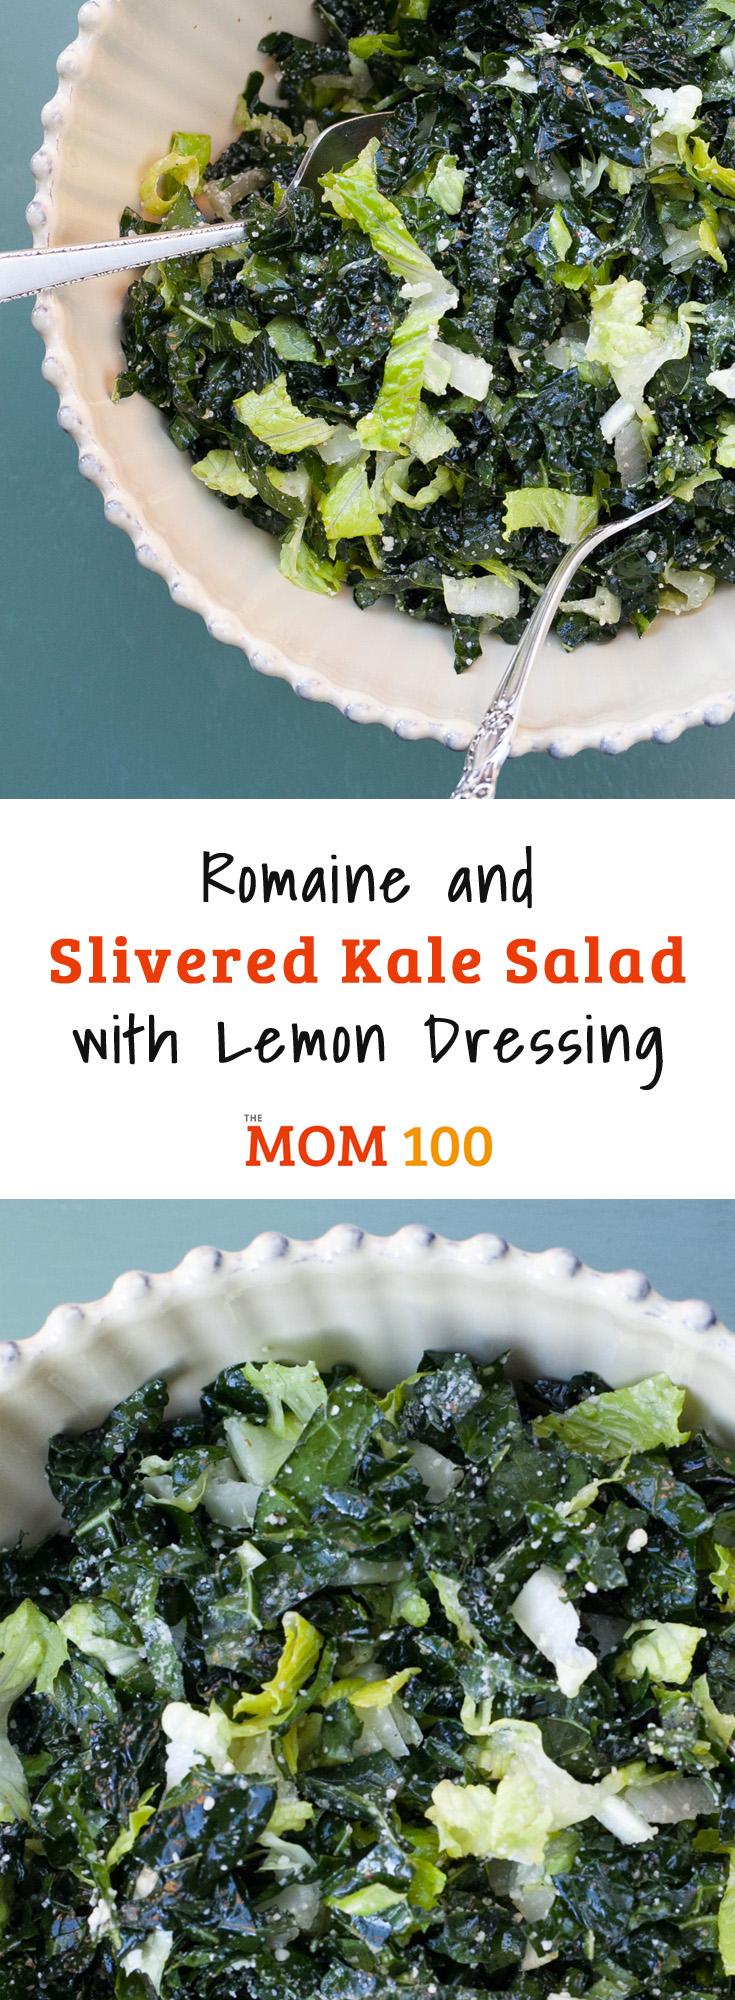 Romaine and Slivered Kale Salad with Lemon Dressing